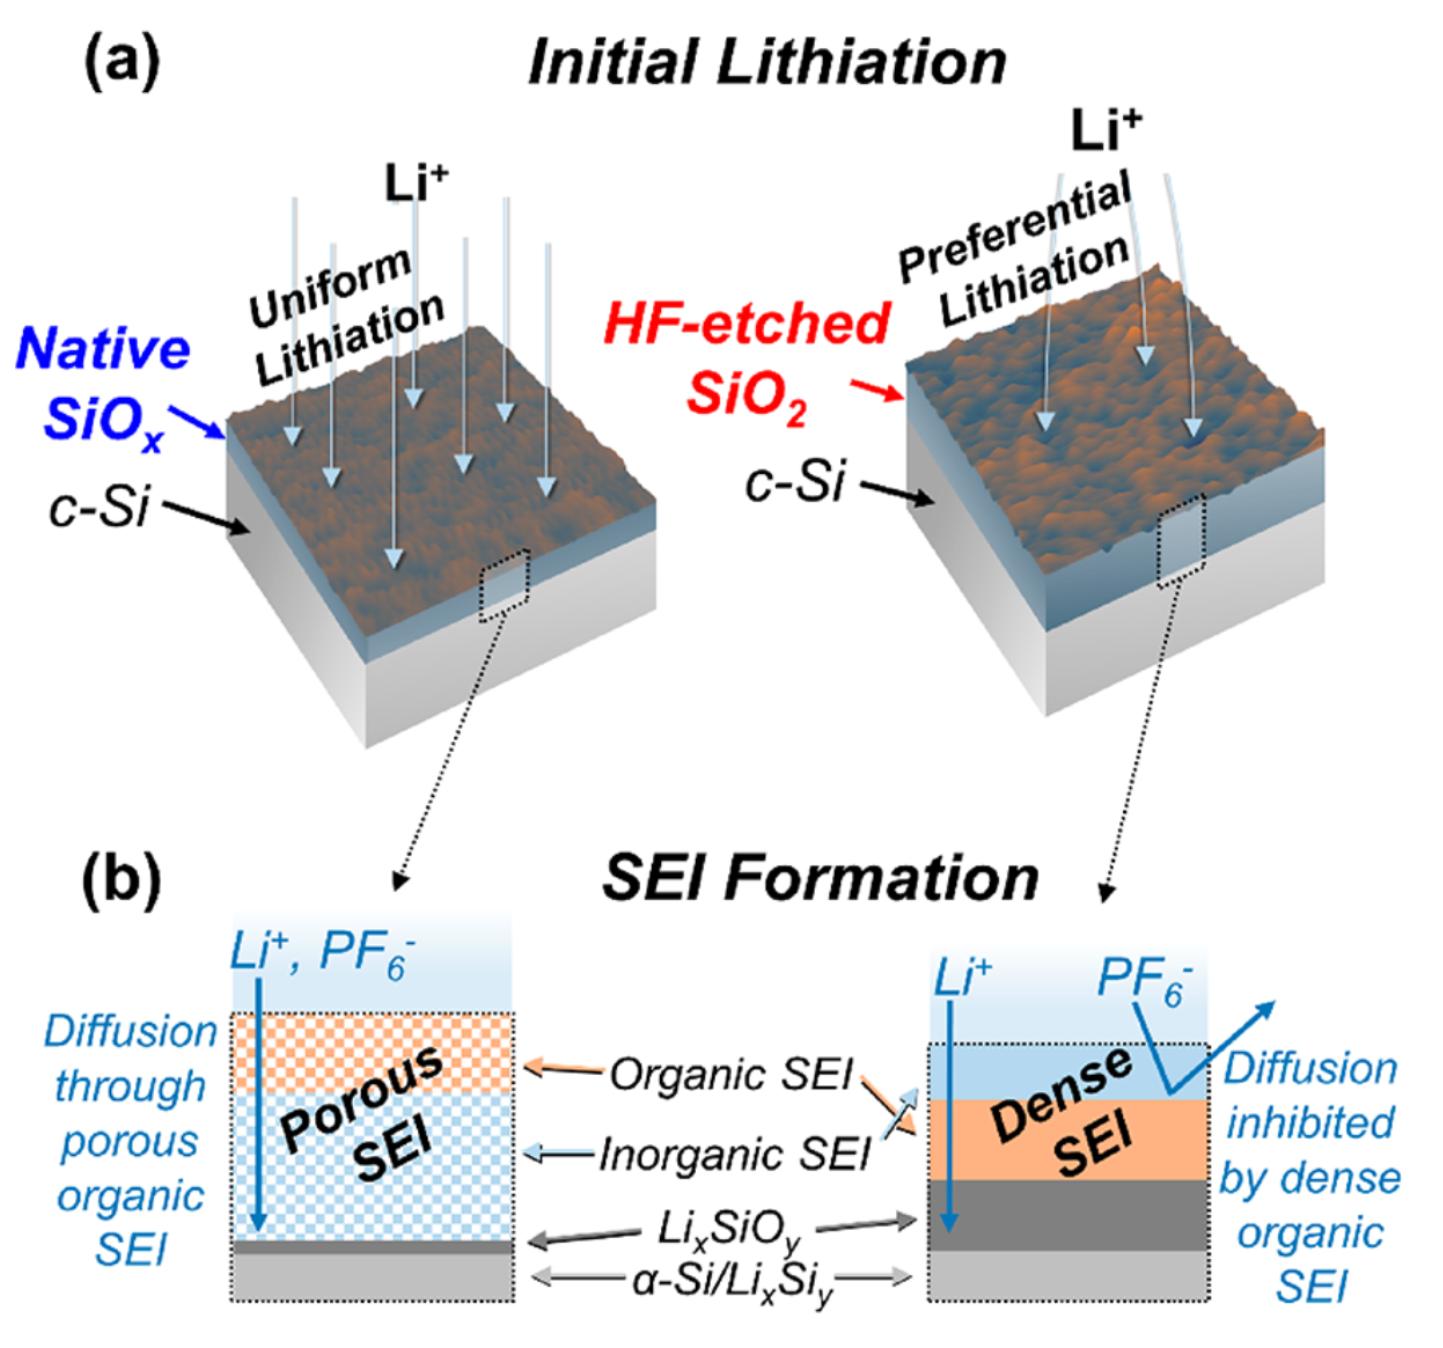 ACS Energy Letters: 硅氧化物表面SEI微观结构的研究